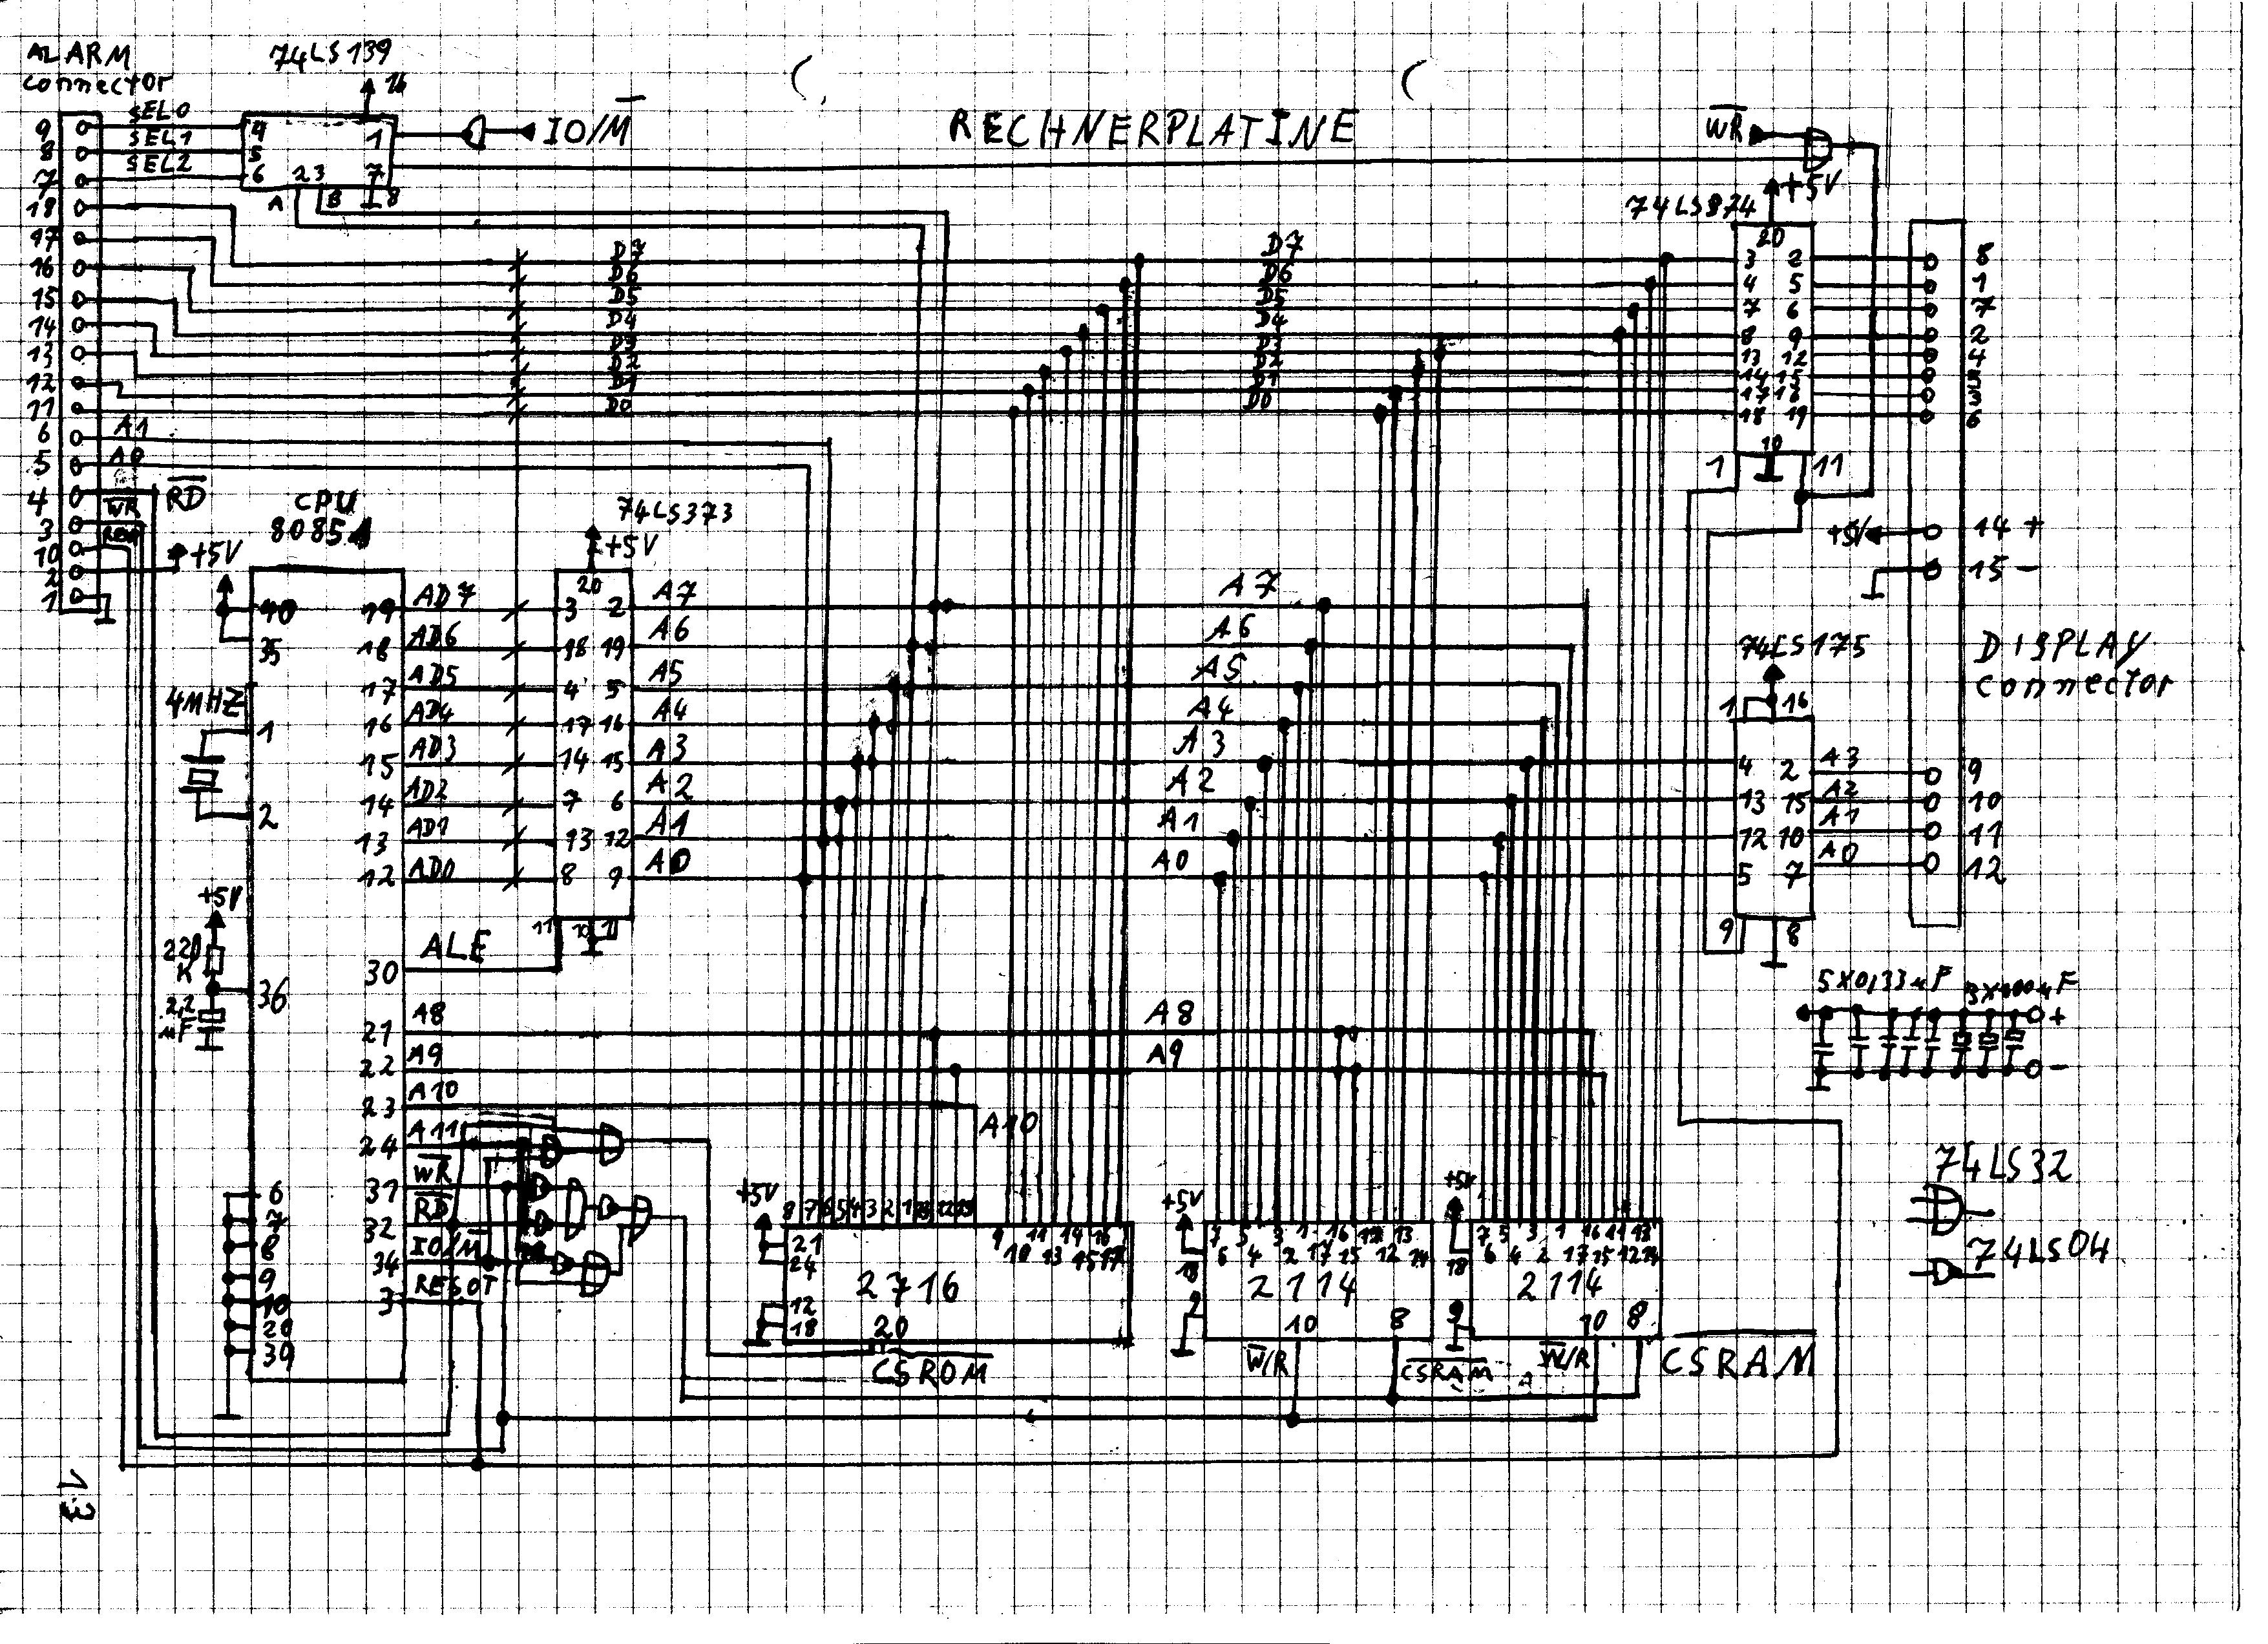 Berühmt Verkehrssignal Schaltplan Galerie - Der Schaltplan ...